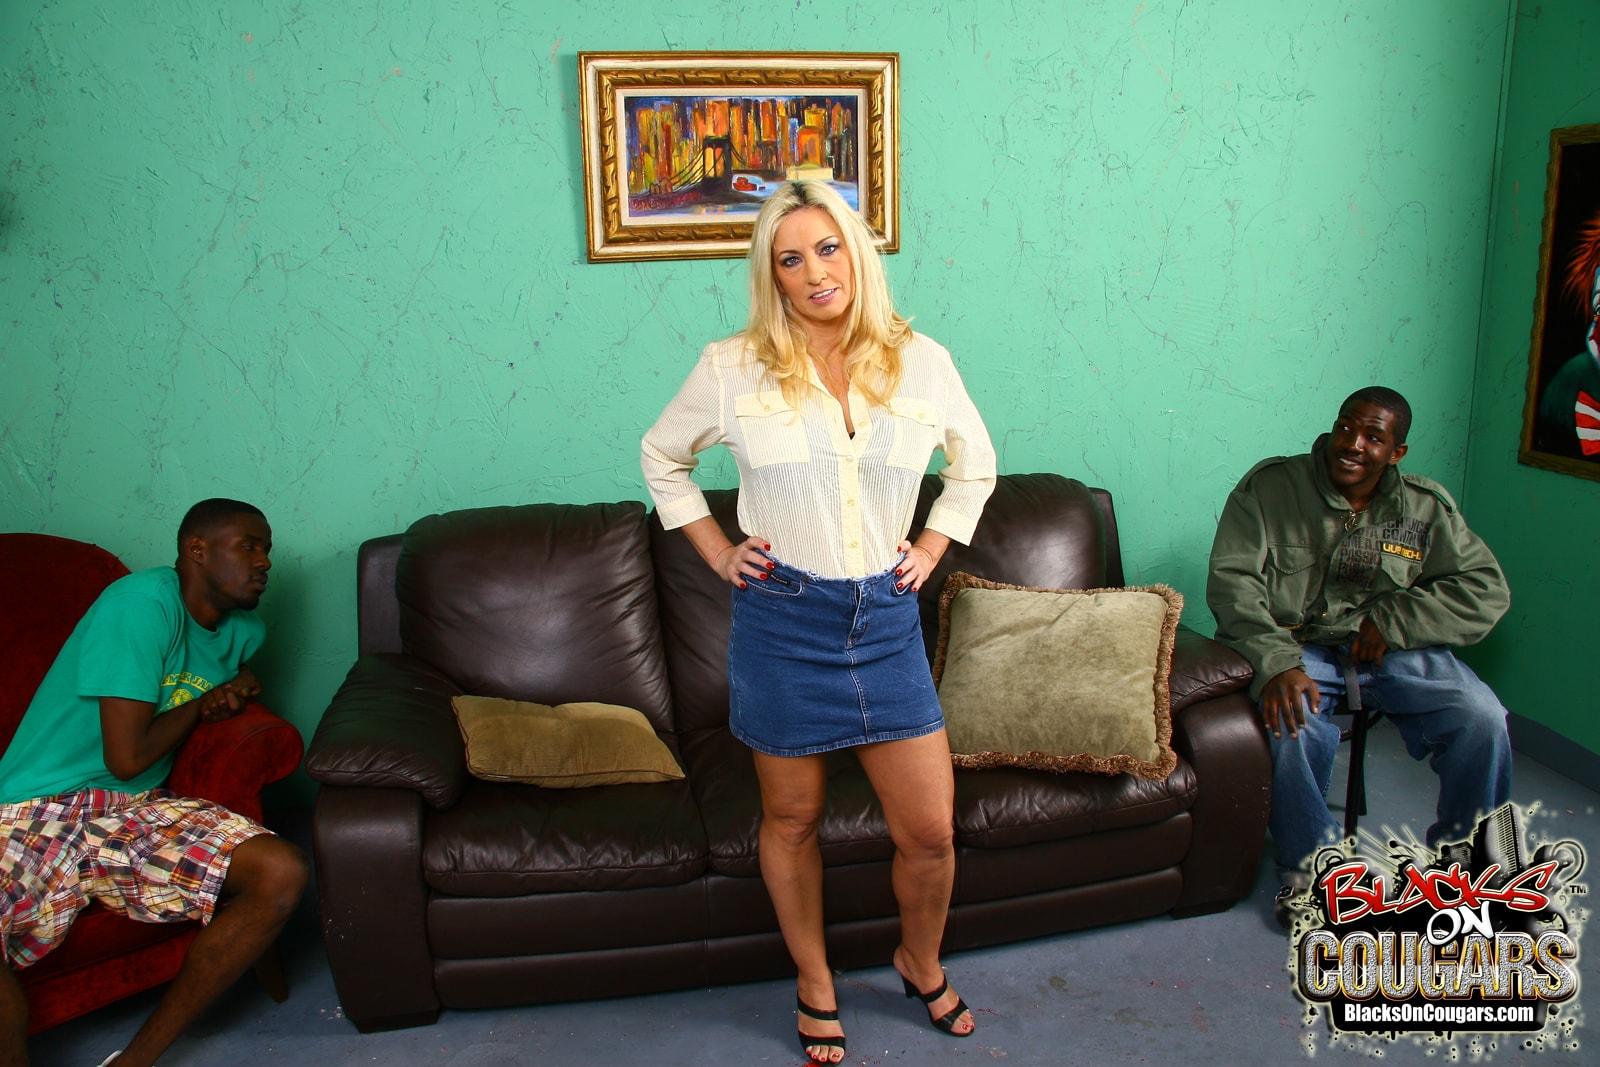 Dogfart '- Blacks On Cougars' starring Cala Craves (Photo 4)